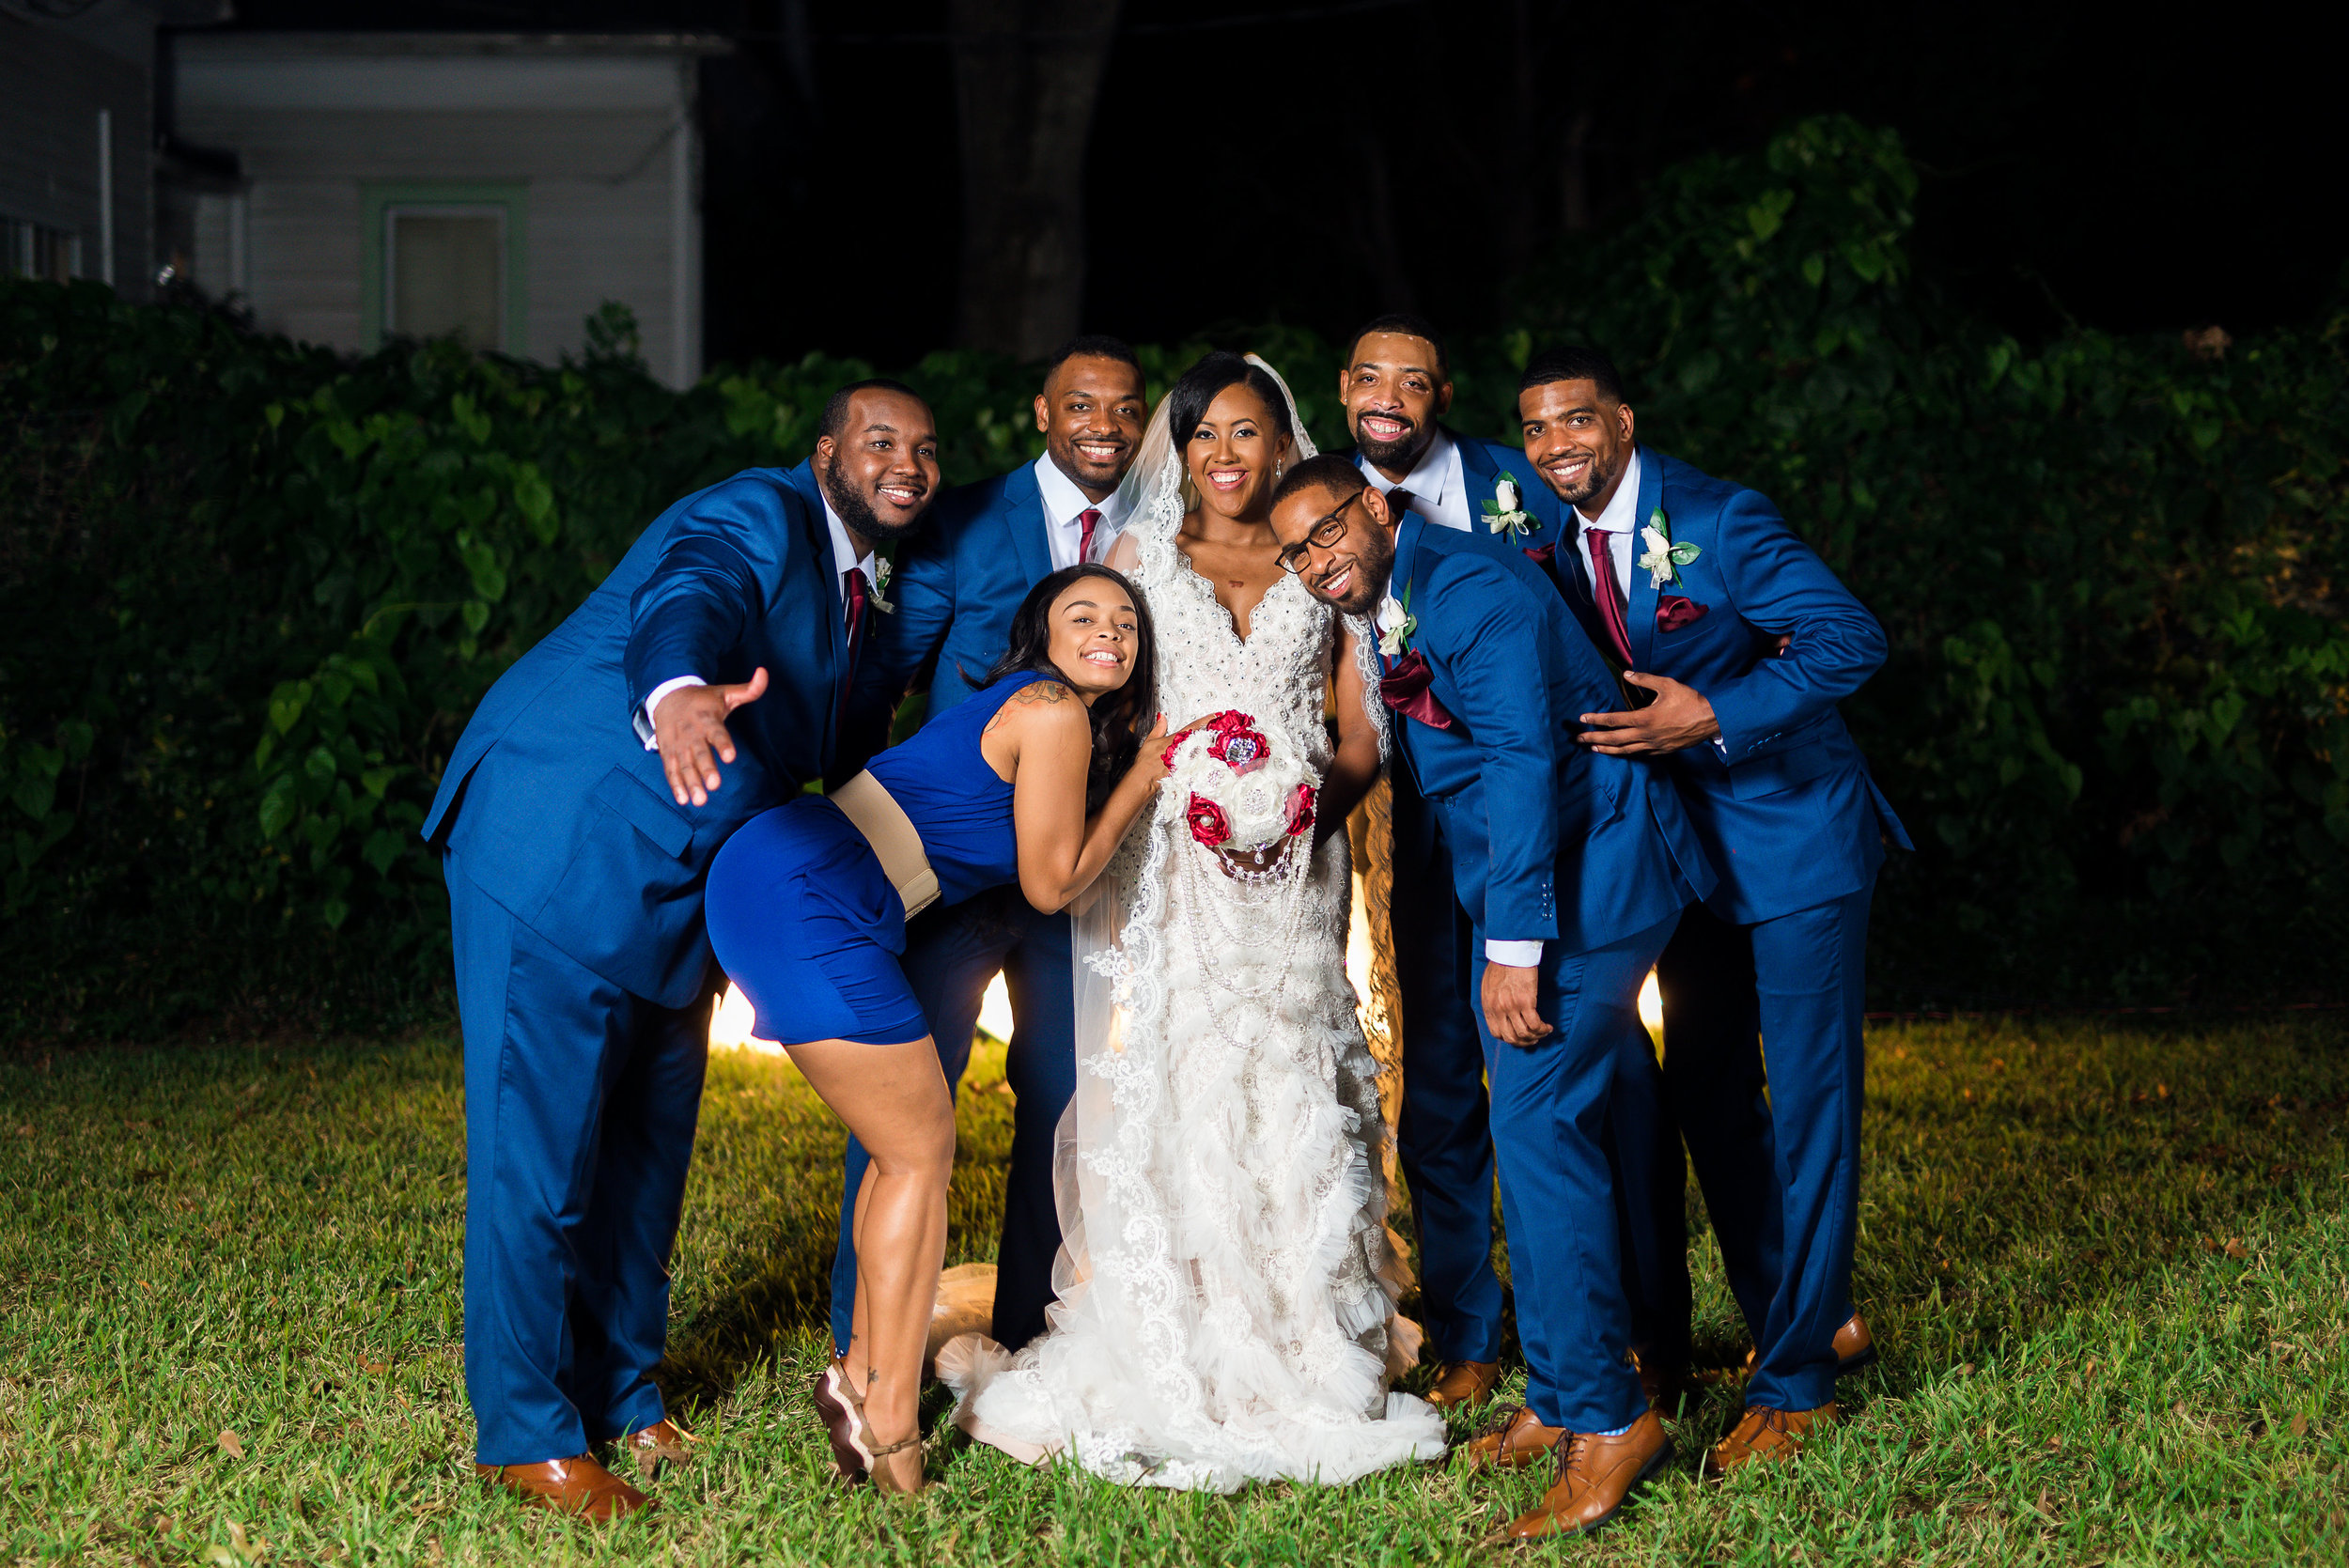 TC-Jessica-Garr-Pharris-Photography-Real-Wedding-32.jpg